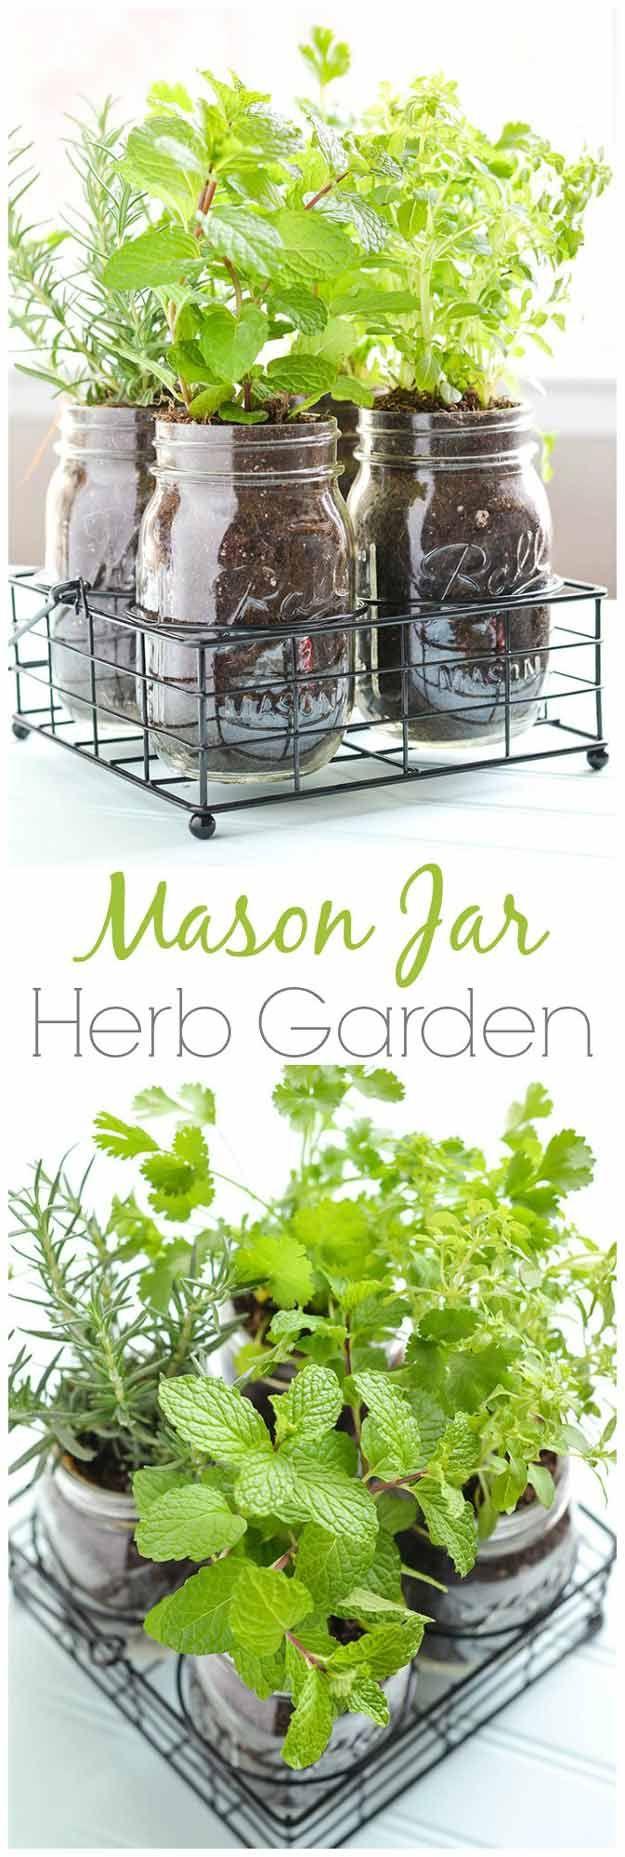 Indoor Herb Garden Ideas Gardens Jars and Mason jar diy